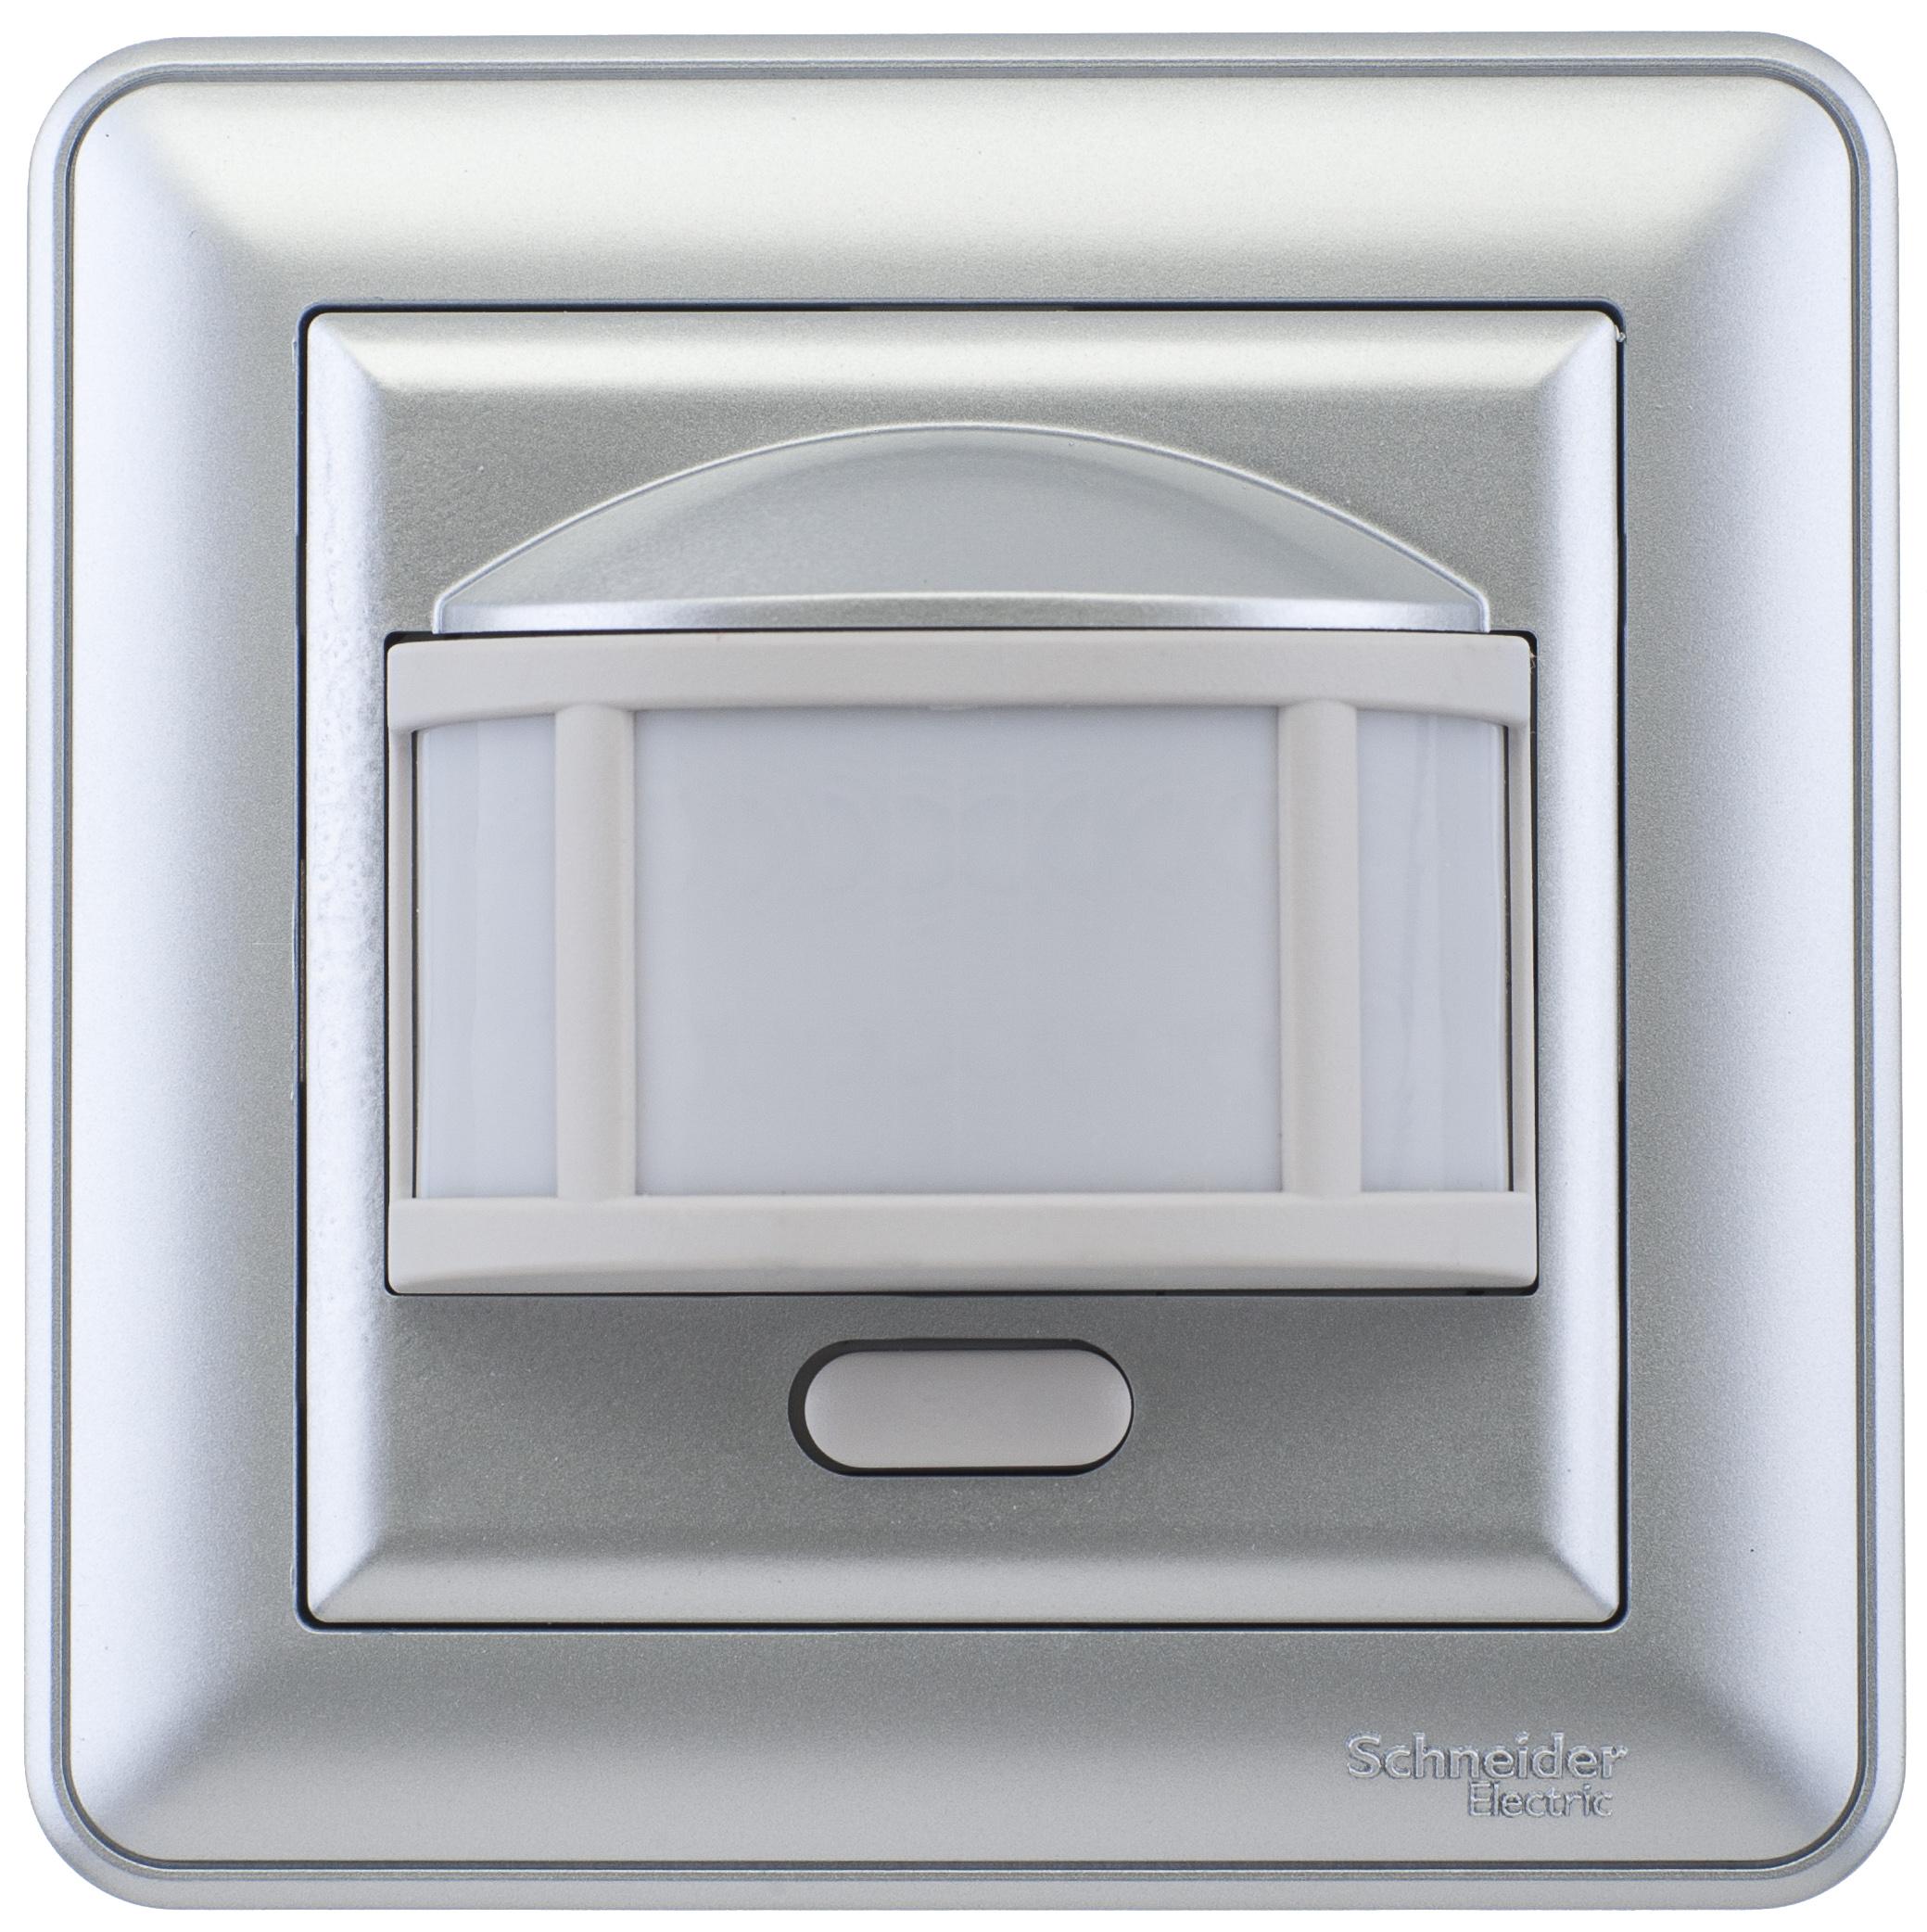 Image Description for https://tedi.itc-electronics.com/itcmedia/images/20190426/DDS25158_SCHNEIDERELECTRIC_2.jpeg